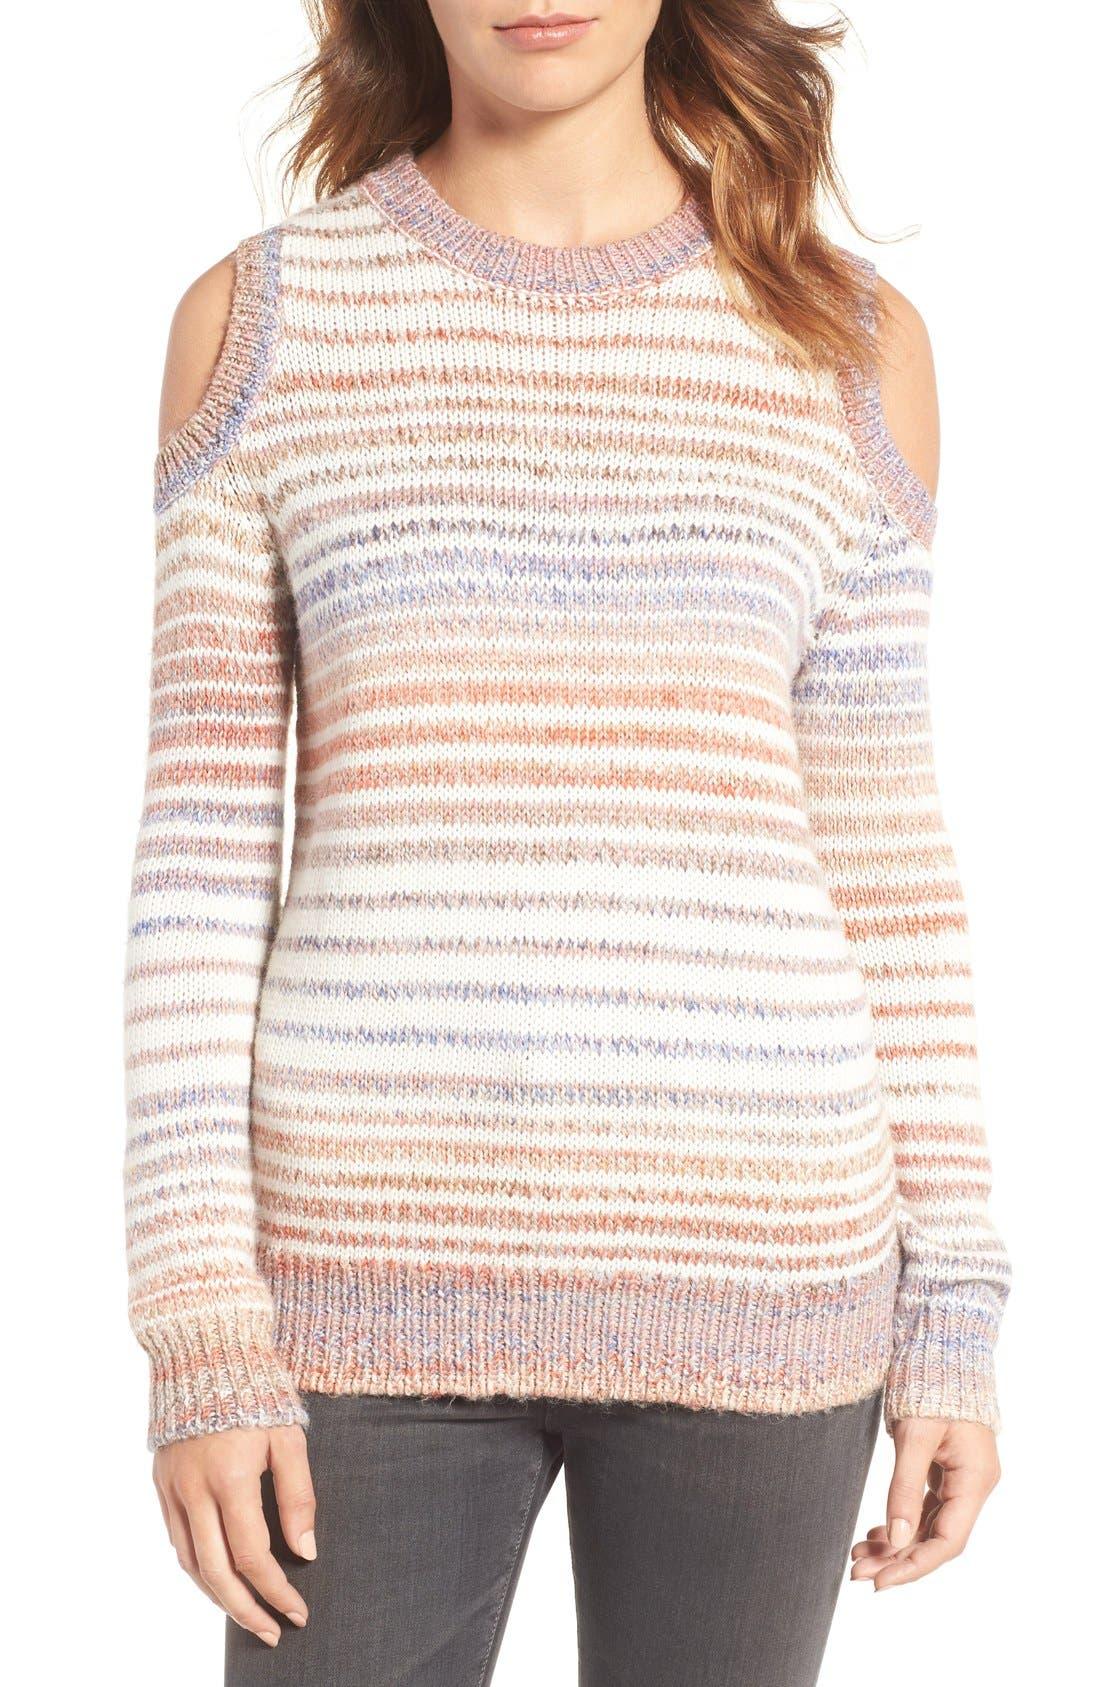 Alternate Image 1 Selected - Rebecca Minkoff Page Stripe Cold Shoulder Sweater